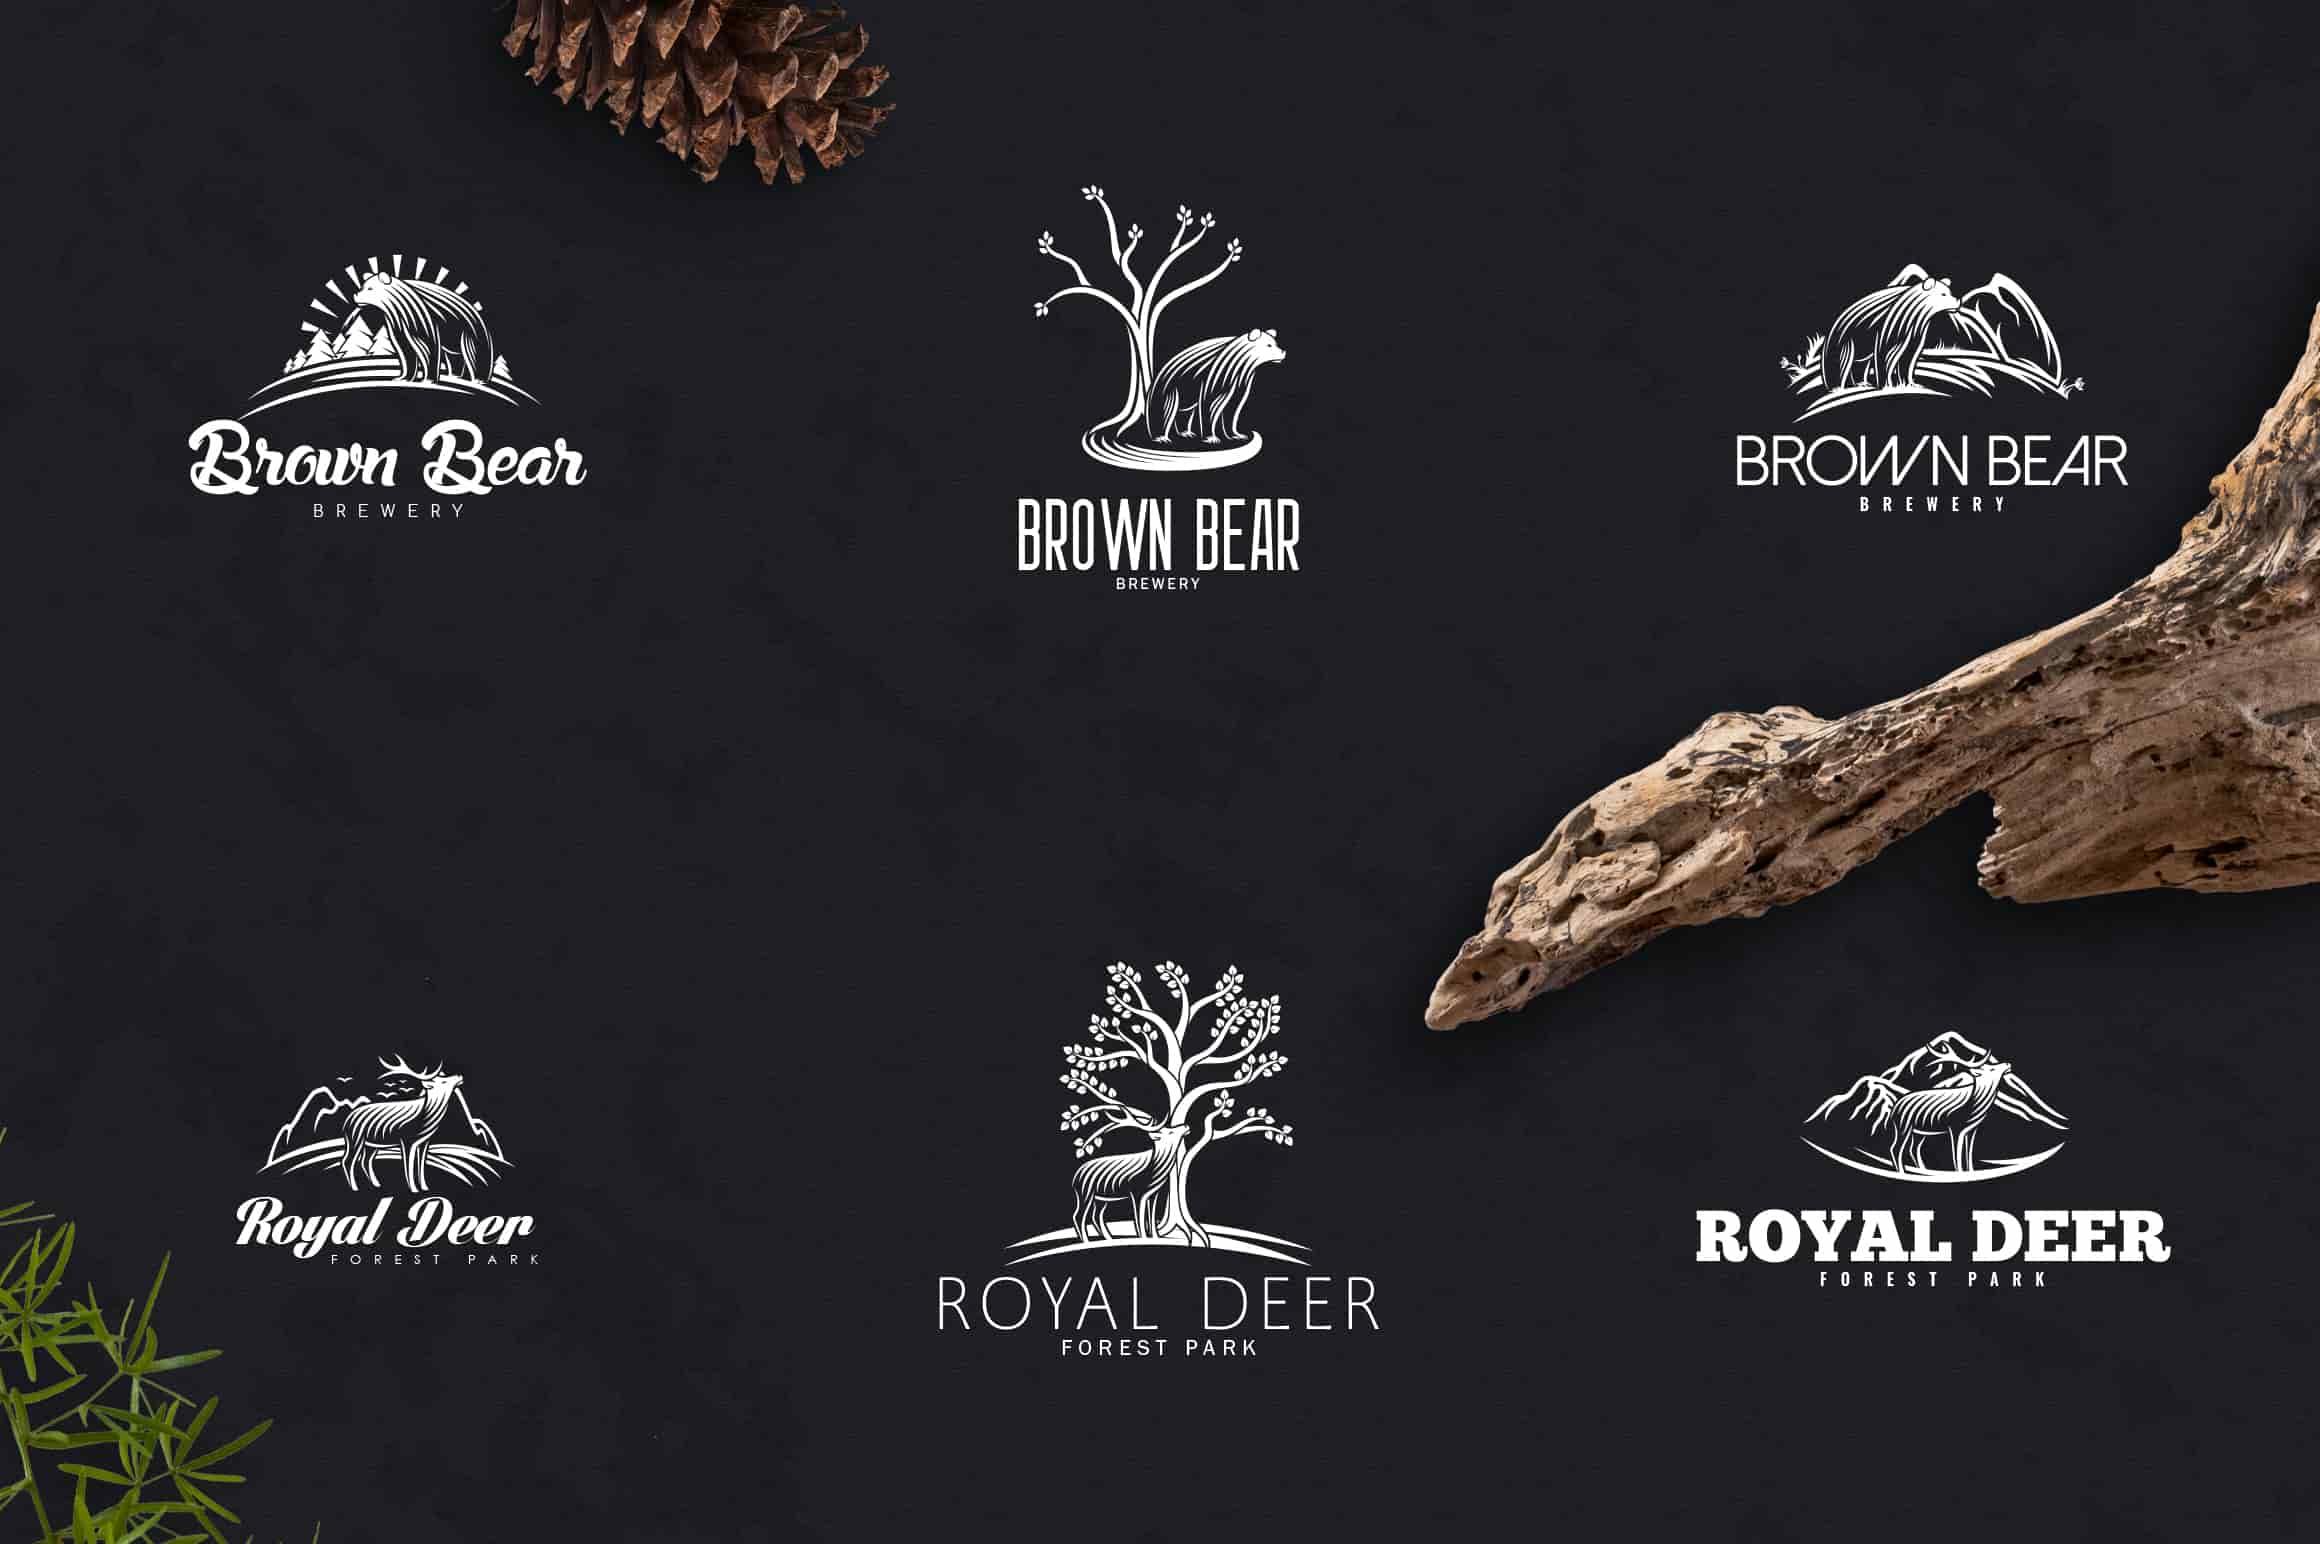 Nature Creation Kit: Fonts, Logo, Elements